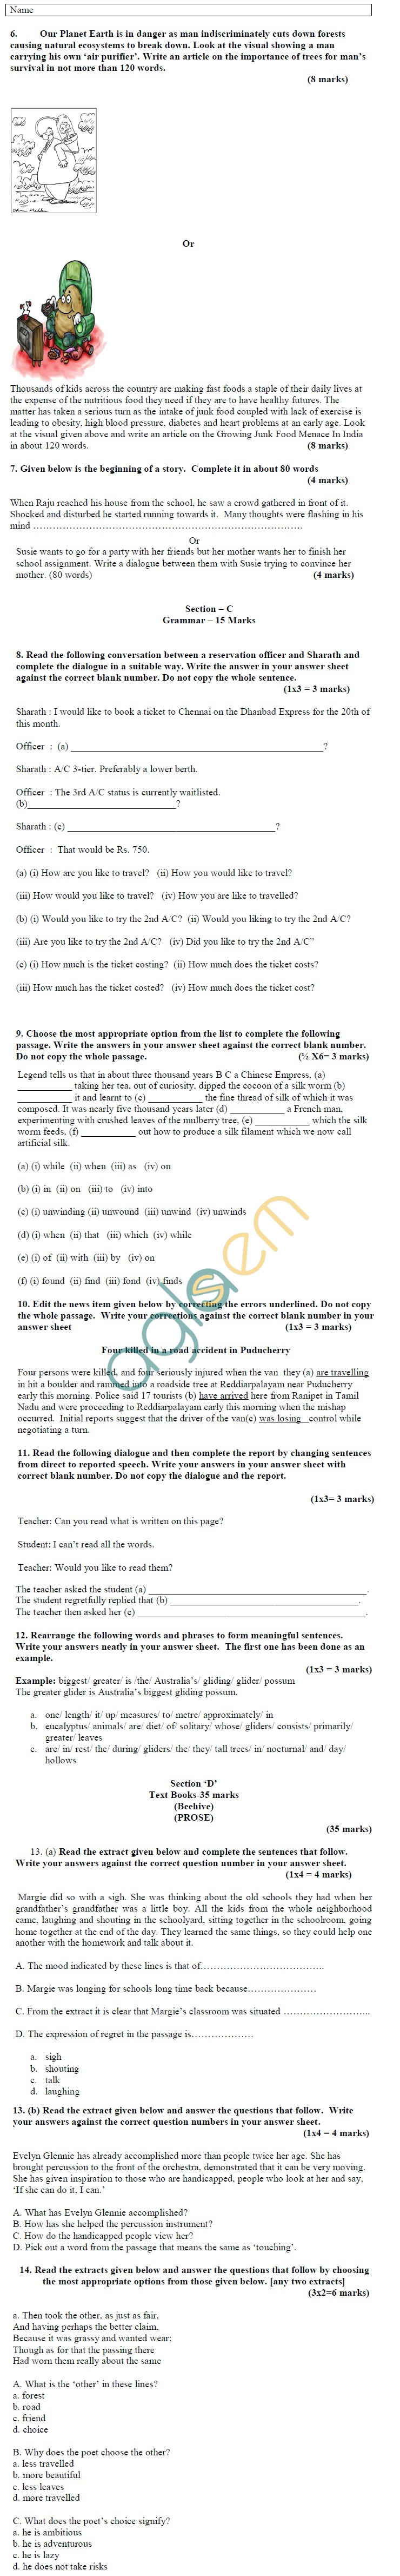 CBSE Board Exam 2013 Sample Papers (SA1) Class IX - English Lang. & Lit.